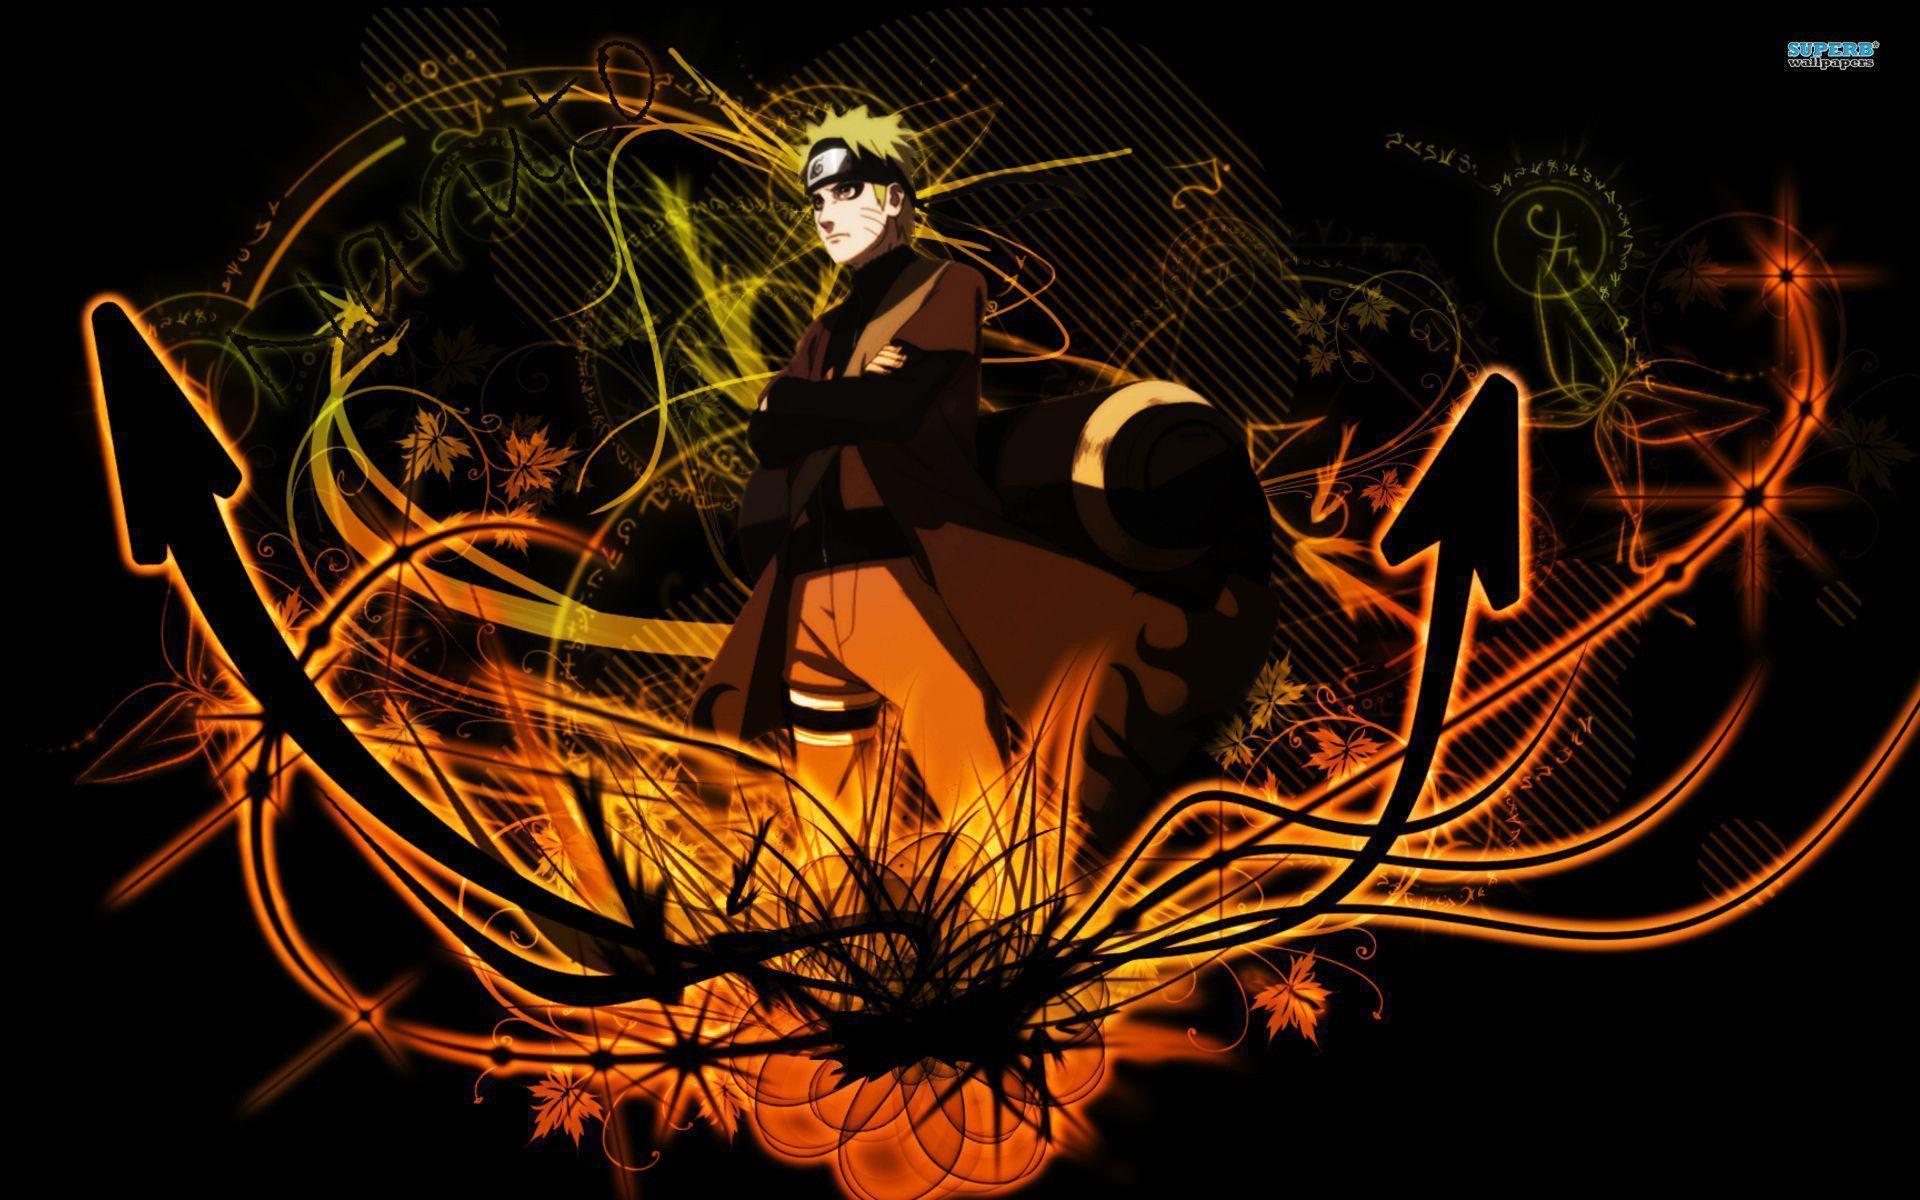 Naruto HD PC Wallpapers - HD Wallpapers Inn